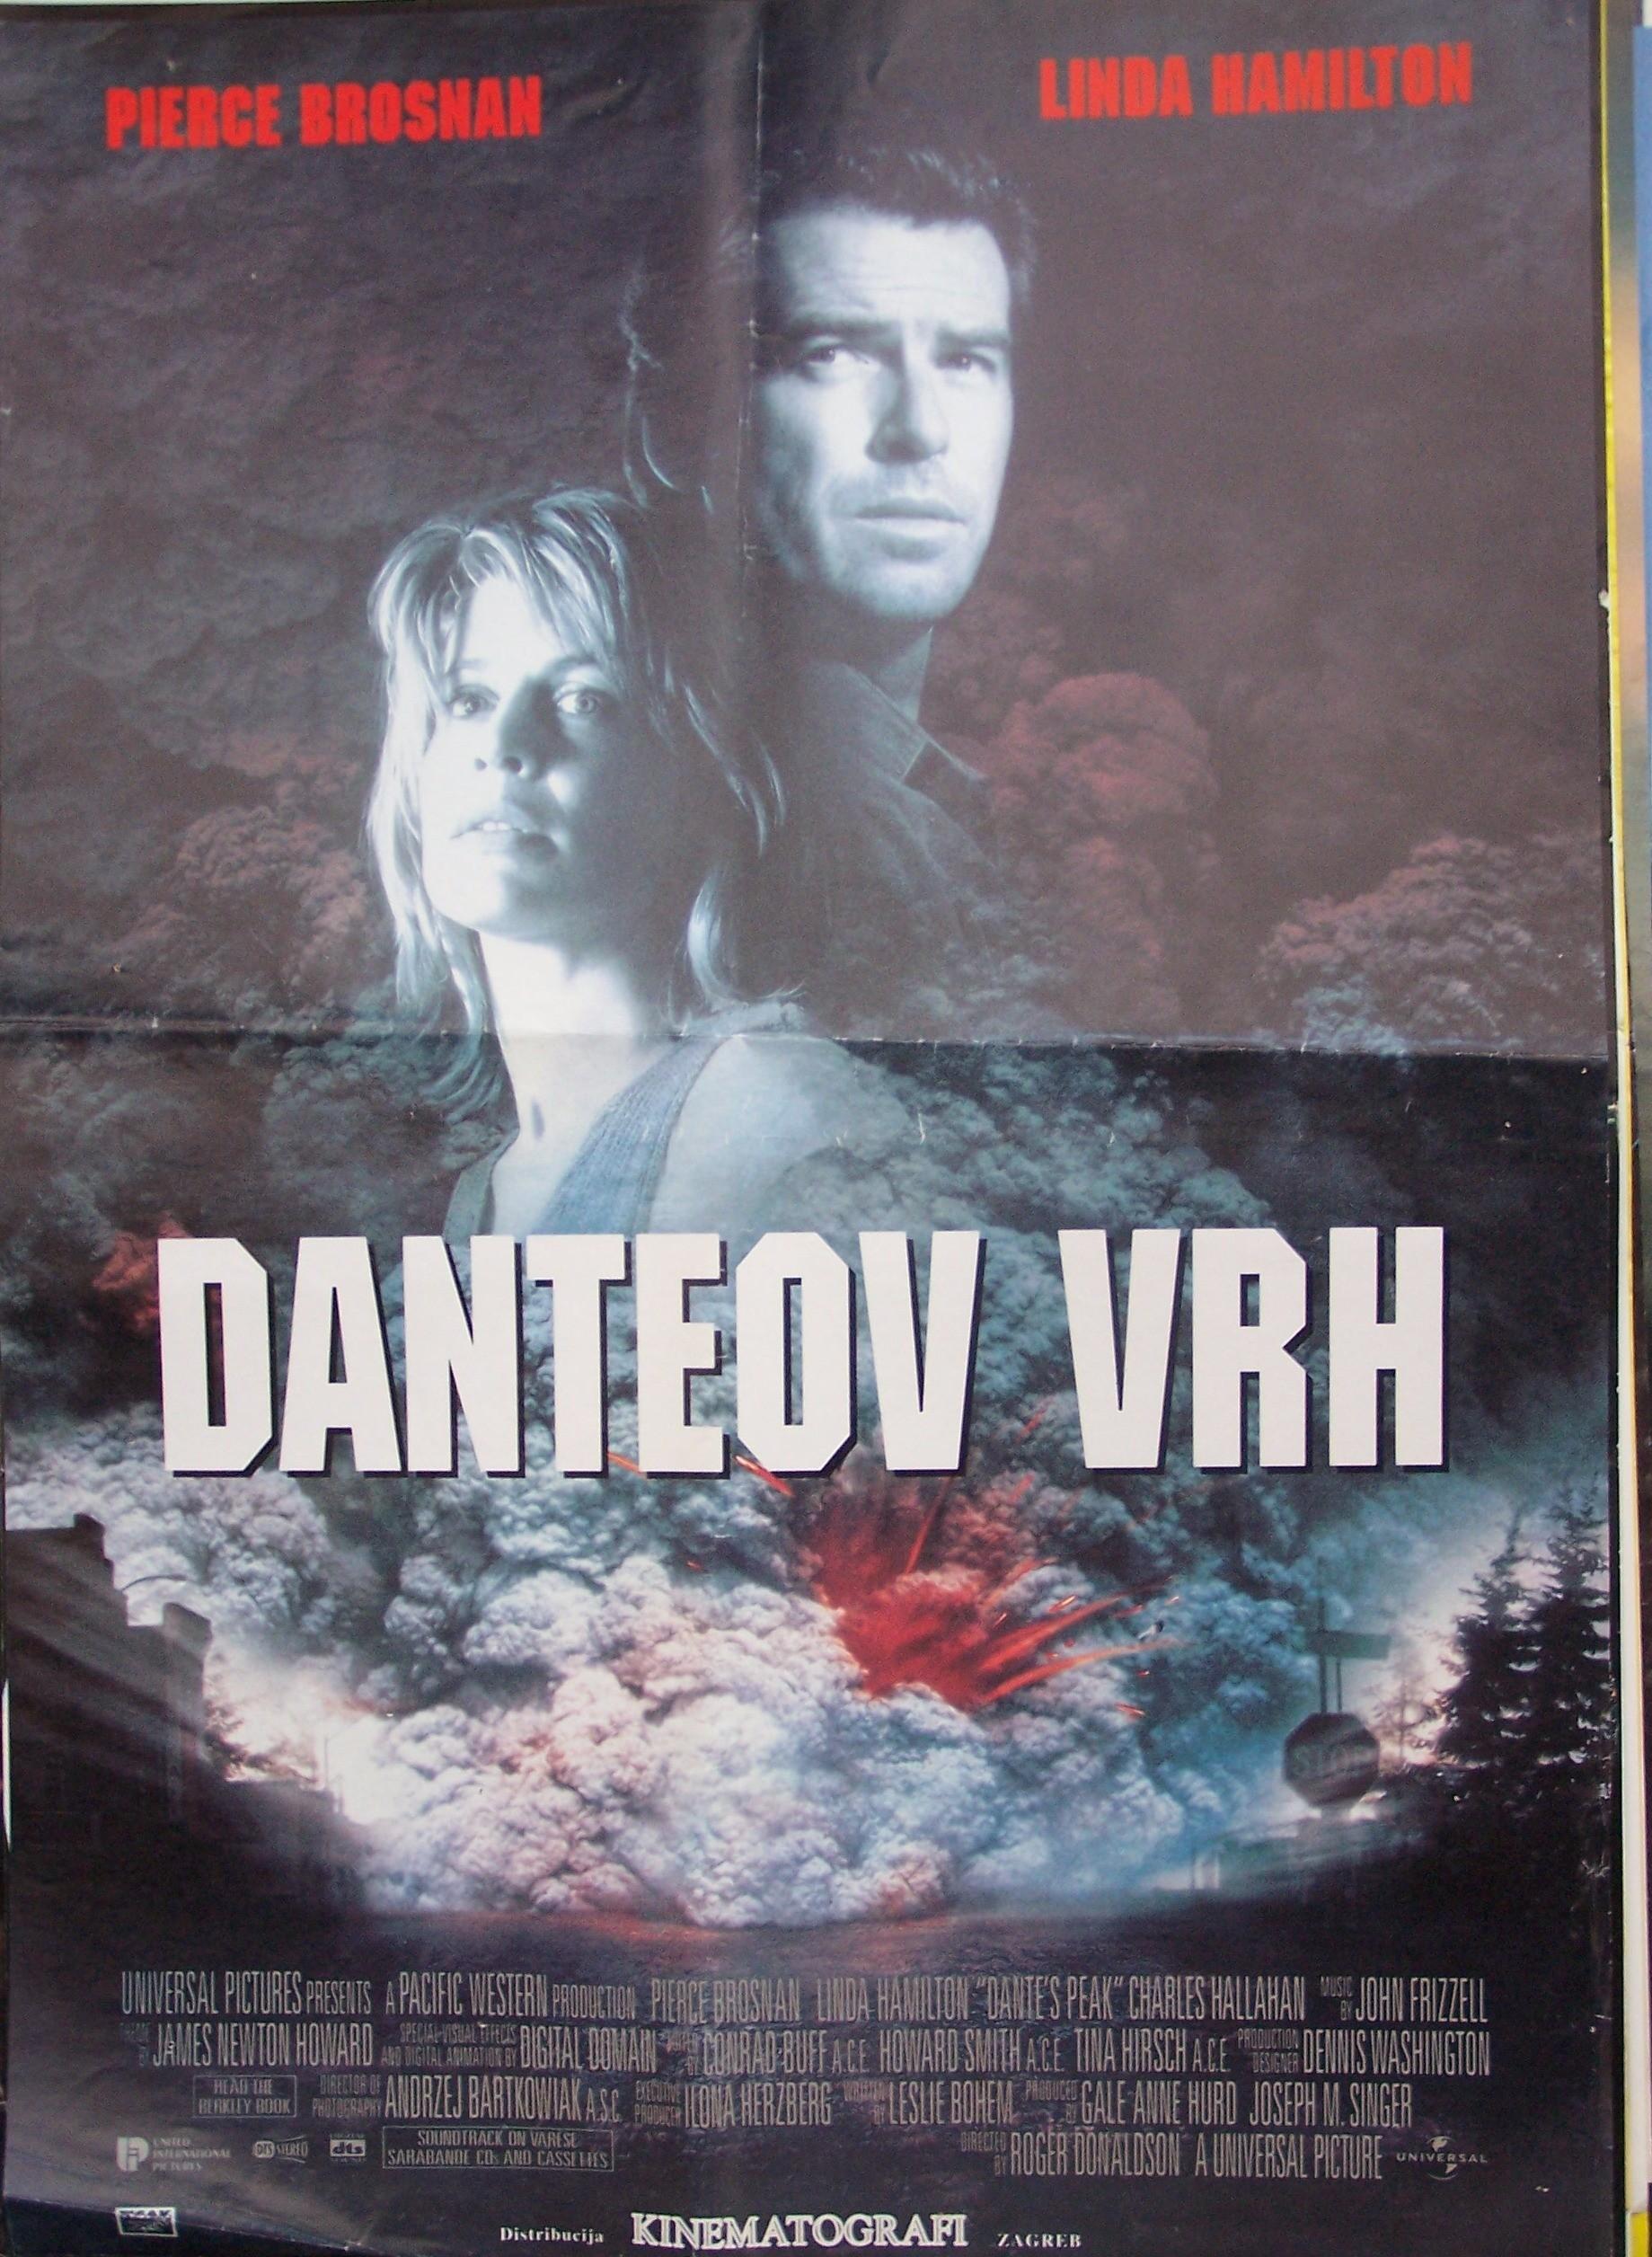 Danteov Vrh